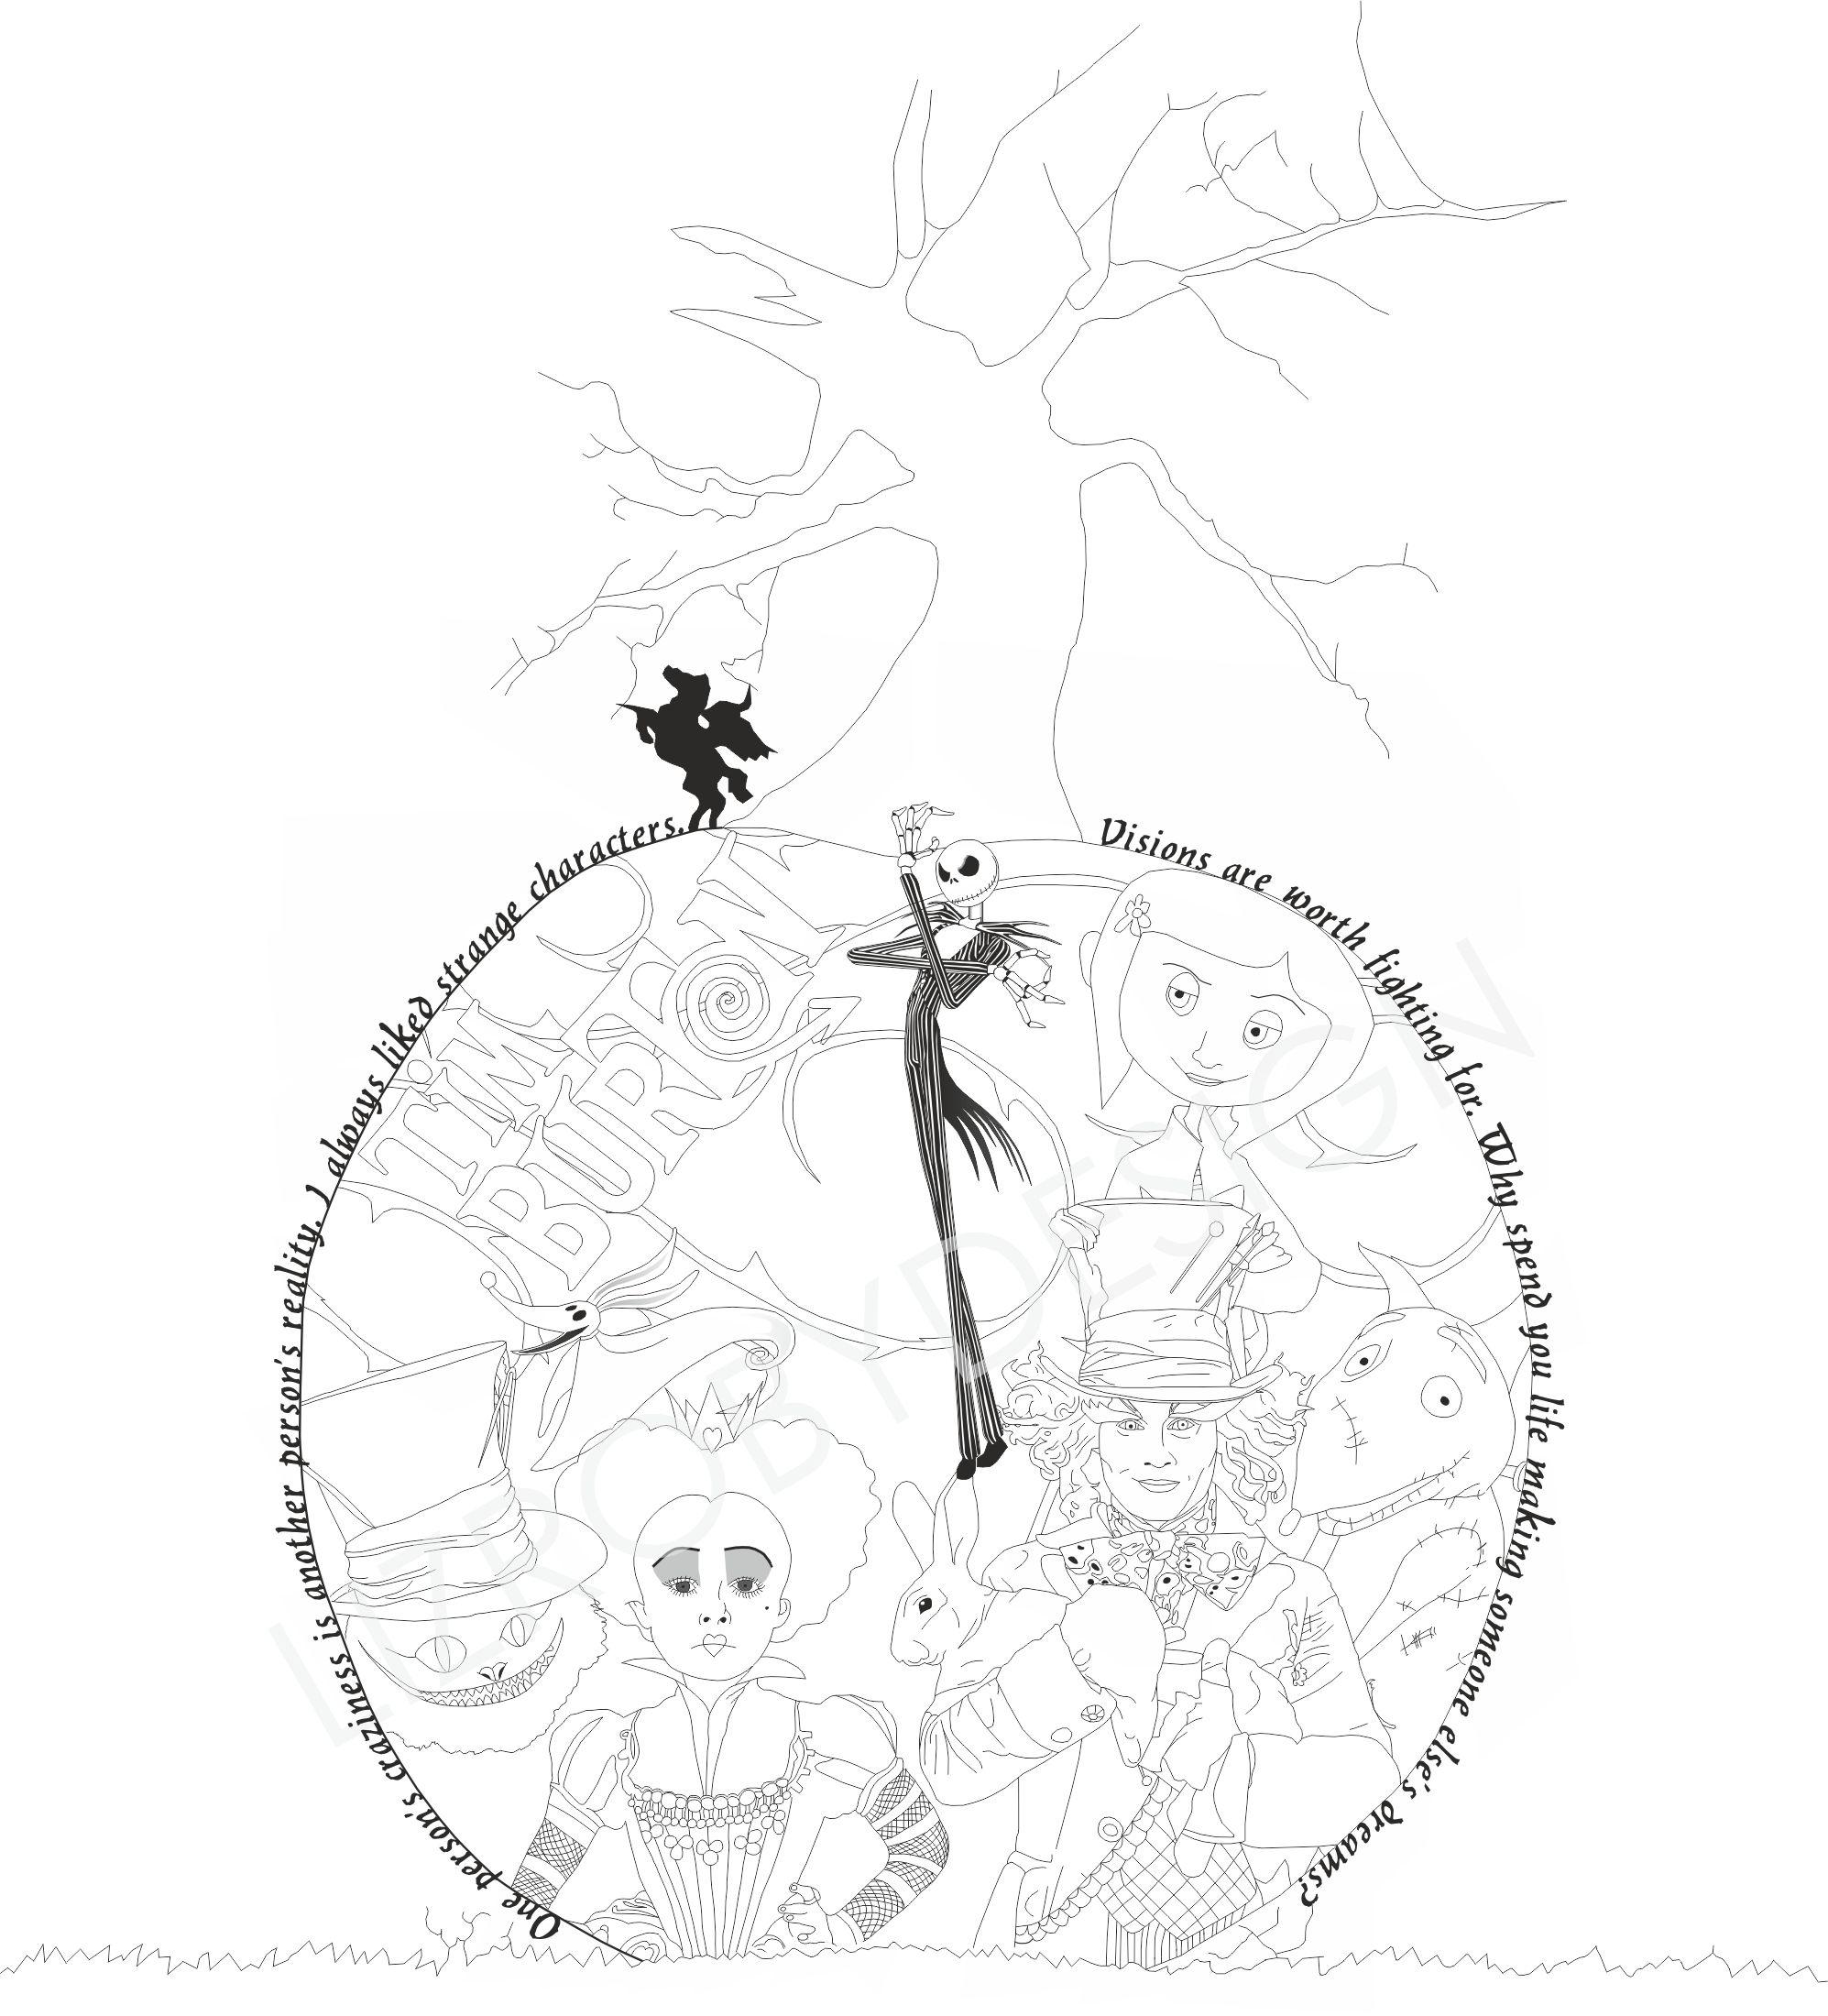 1995x2200 Tim Burton Tattoo Sleepy Hollow, Jack Skeleton, James And